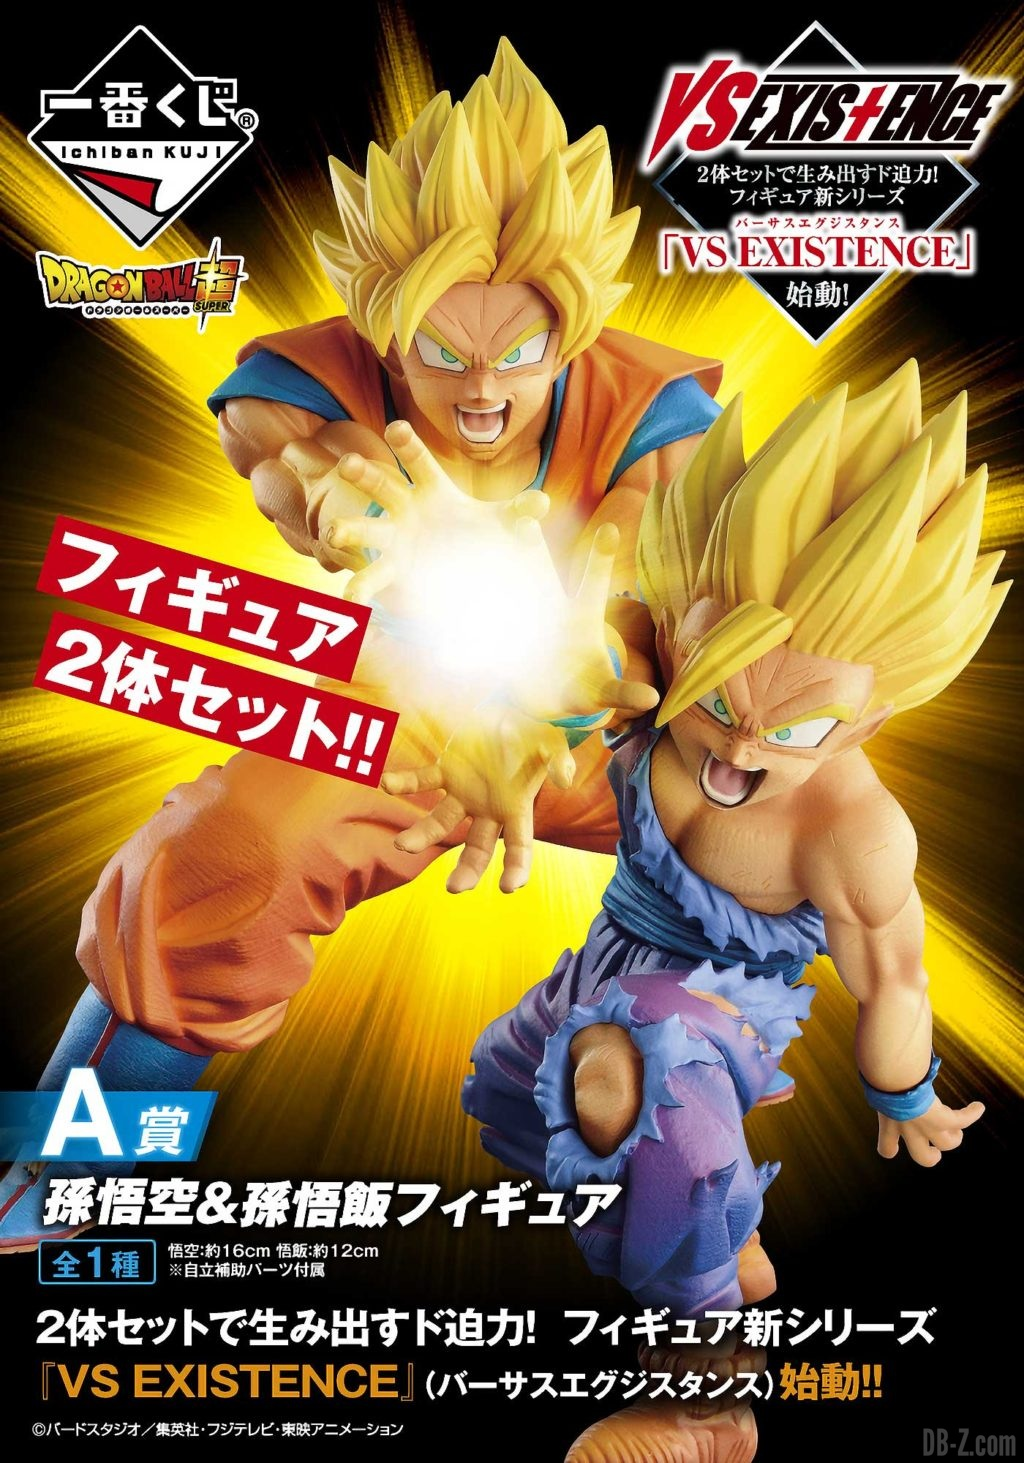 Ichiban Kuji Dragon Ball VS Existence